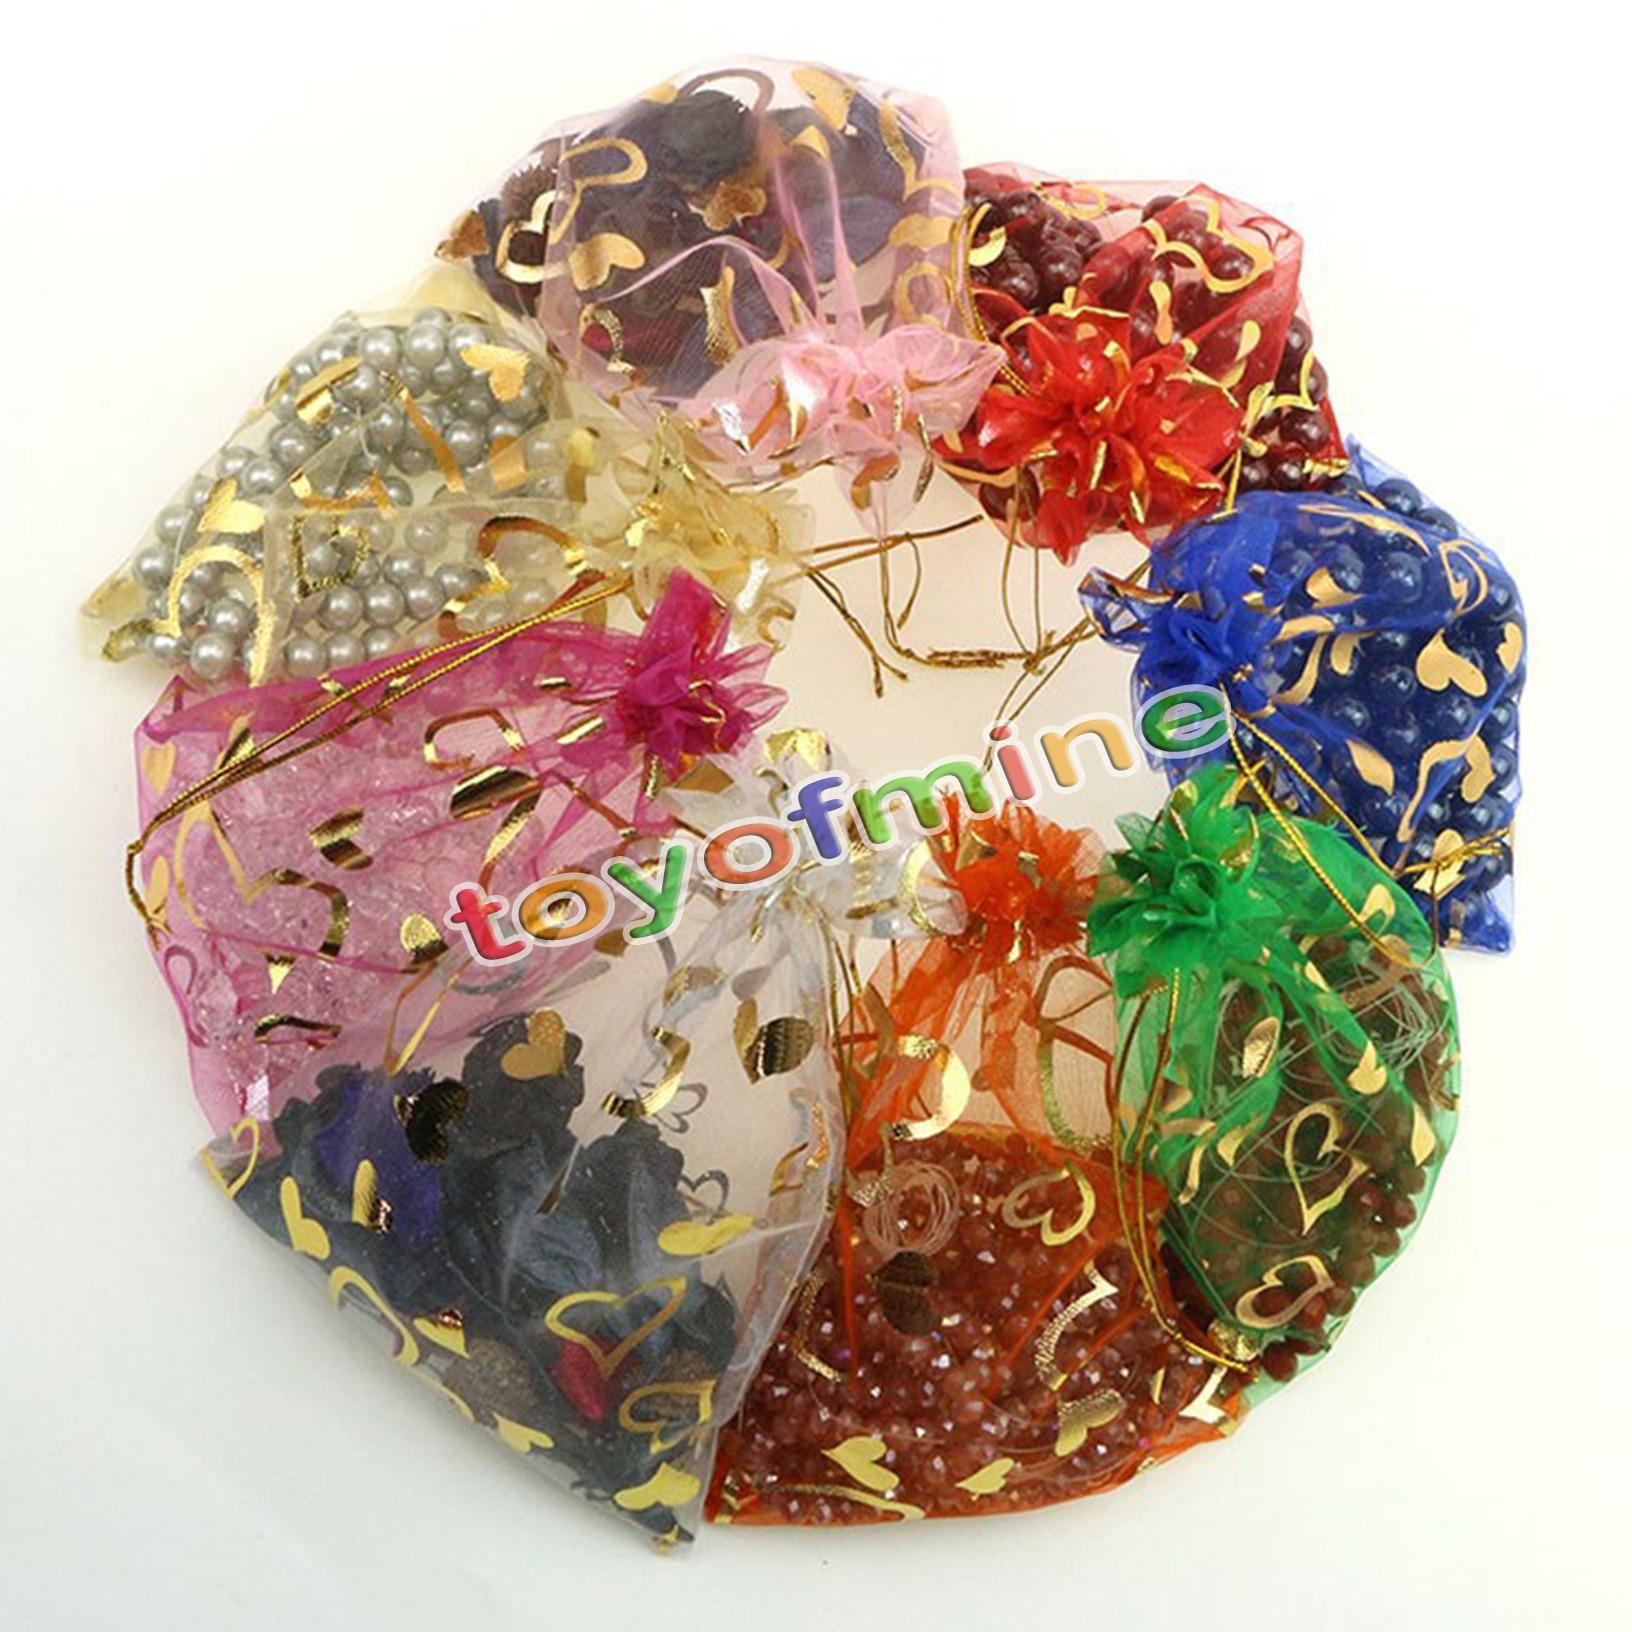 50pcs lot wholesale organza bags 9x12 cm wedding pouches